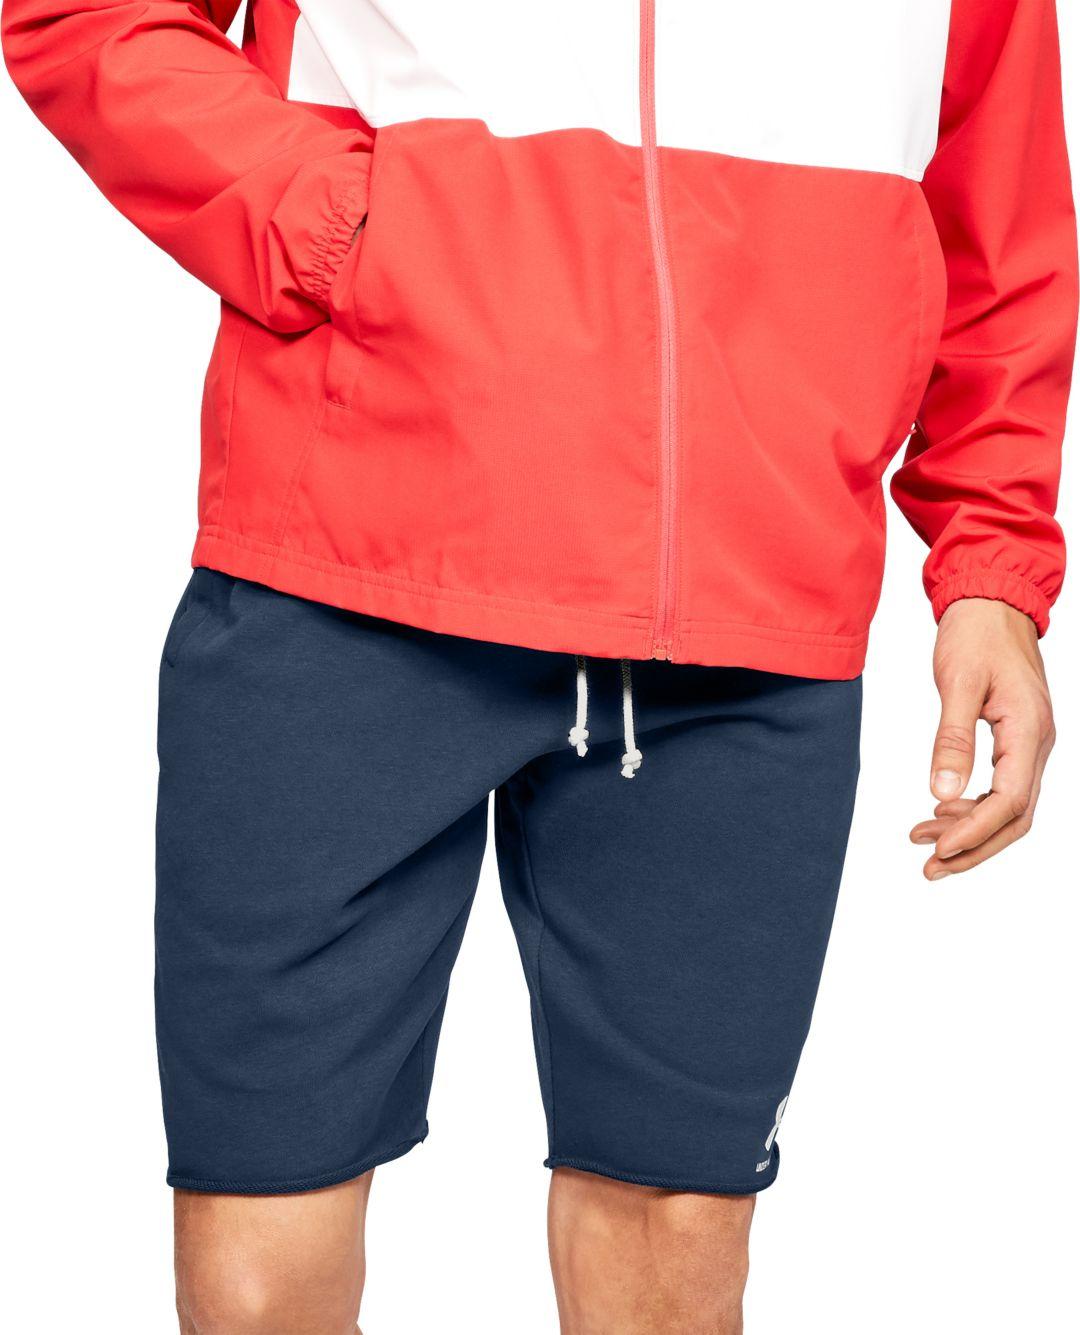 174126fe0 Under Armour Men's Sportstyle Terry Fleece Shorts | DICK'S Sporting ...